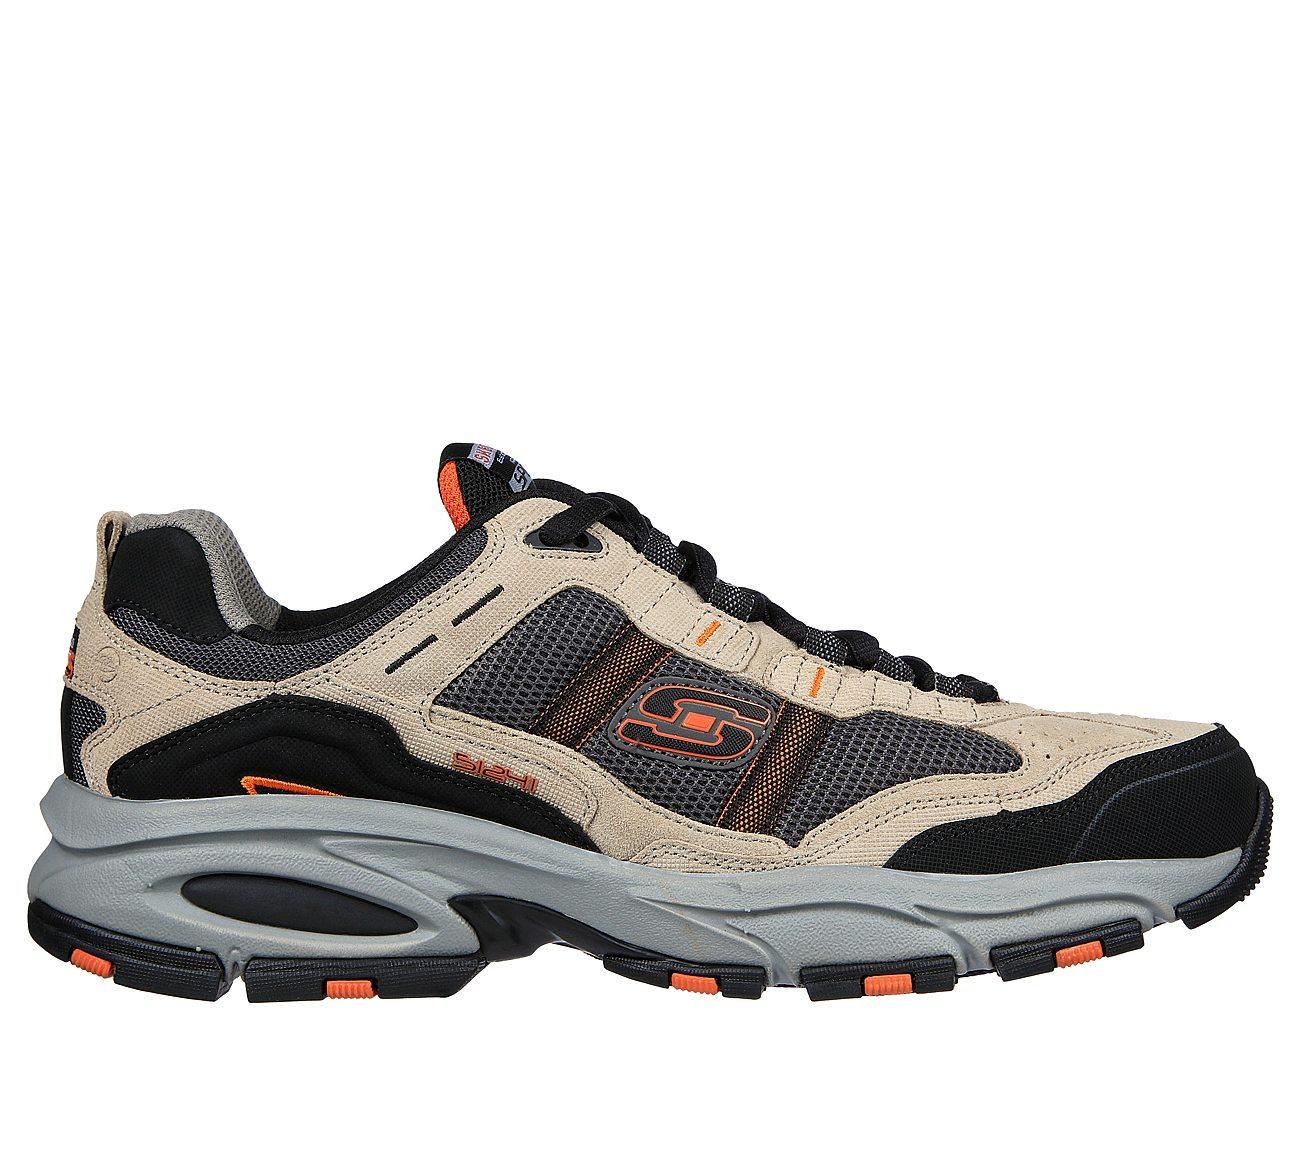 Buy SKECHERS Vigor 2.0 - Trait Sport Shoes